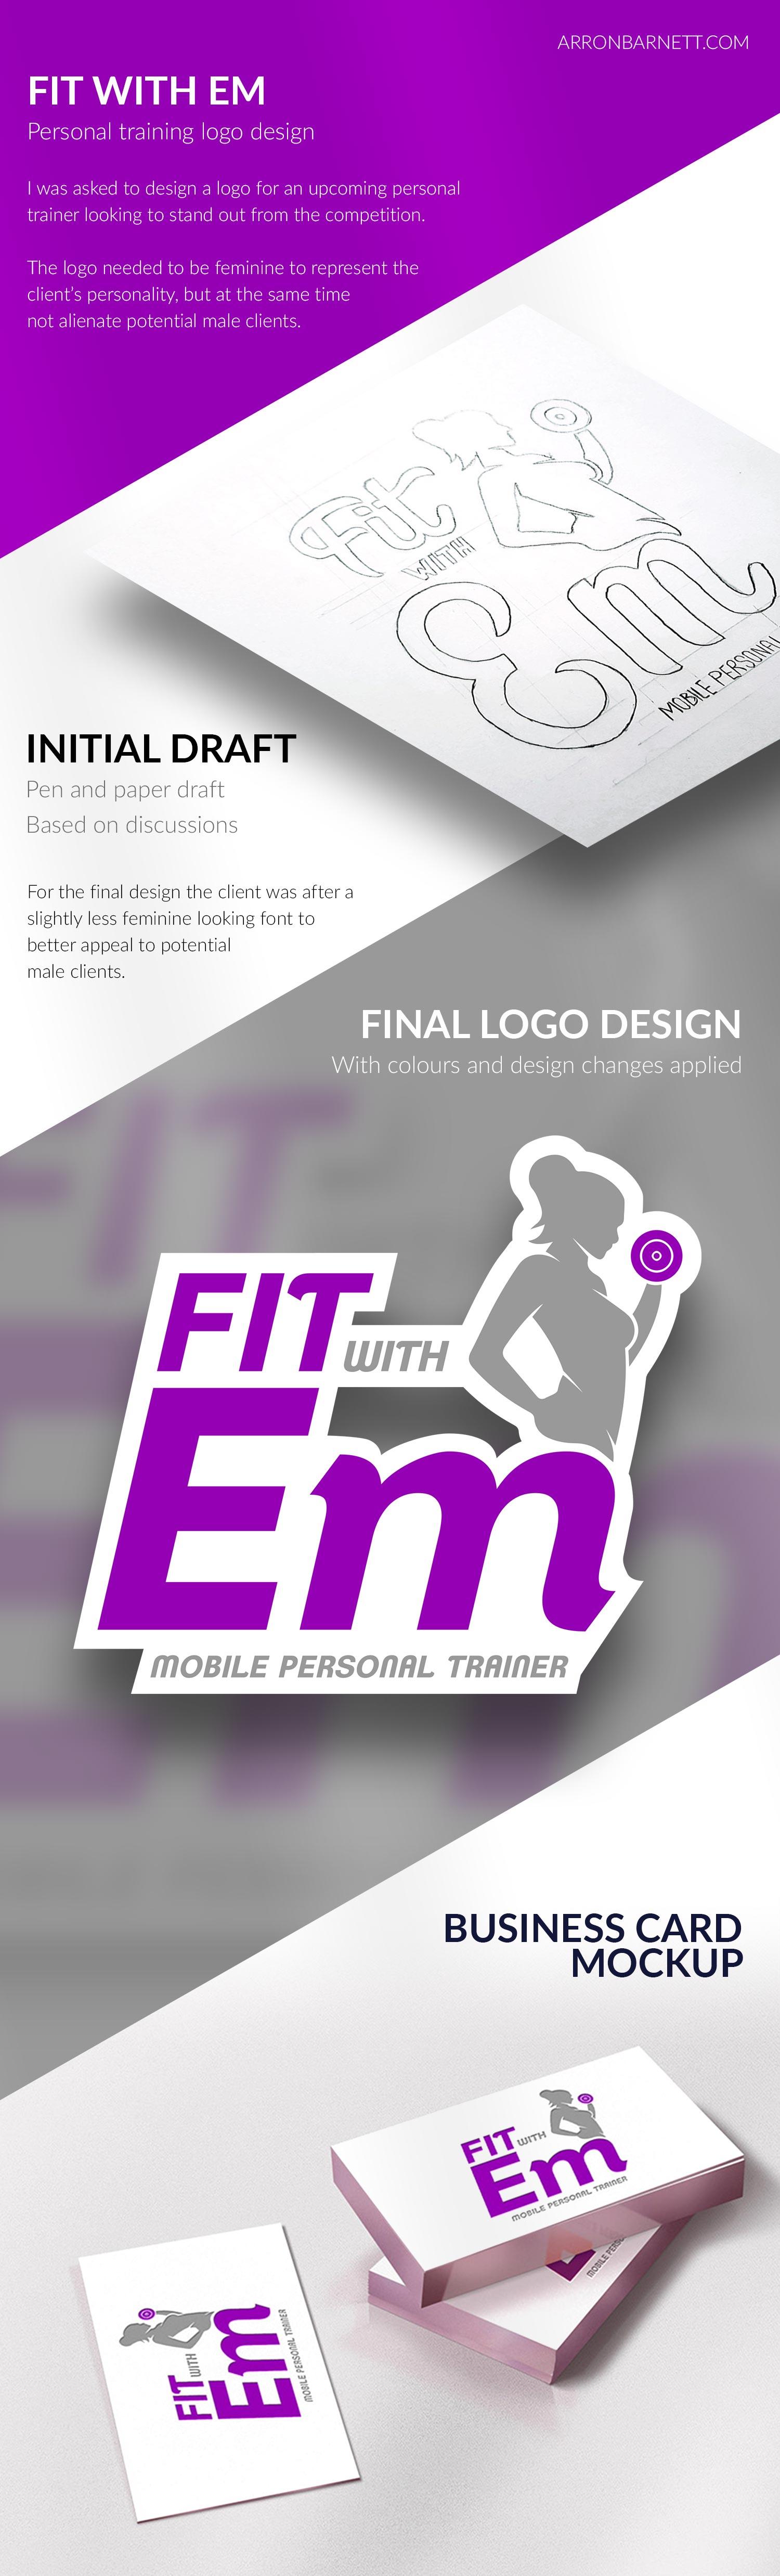 Fit With Em Logo Design